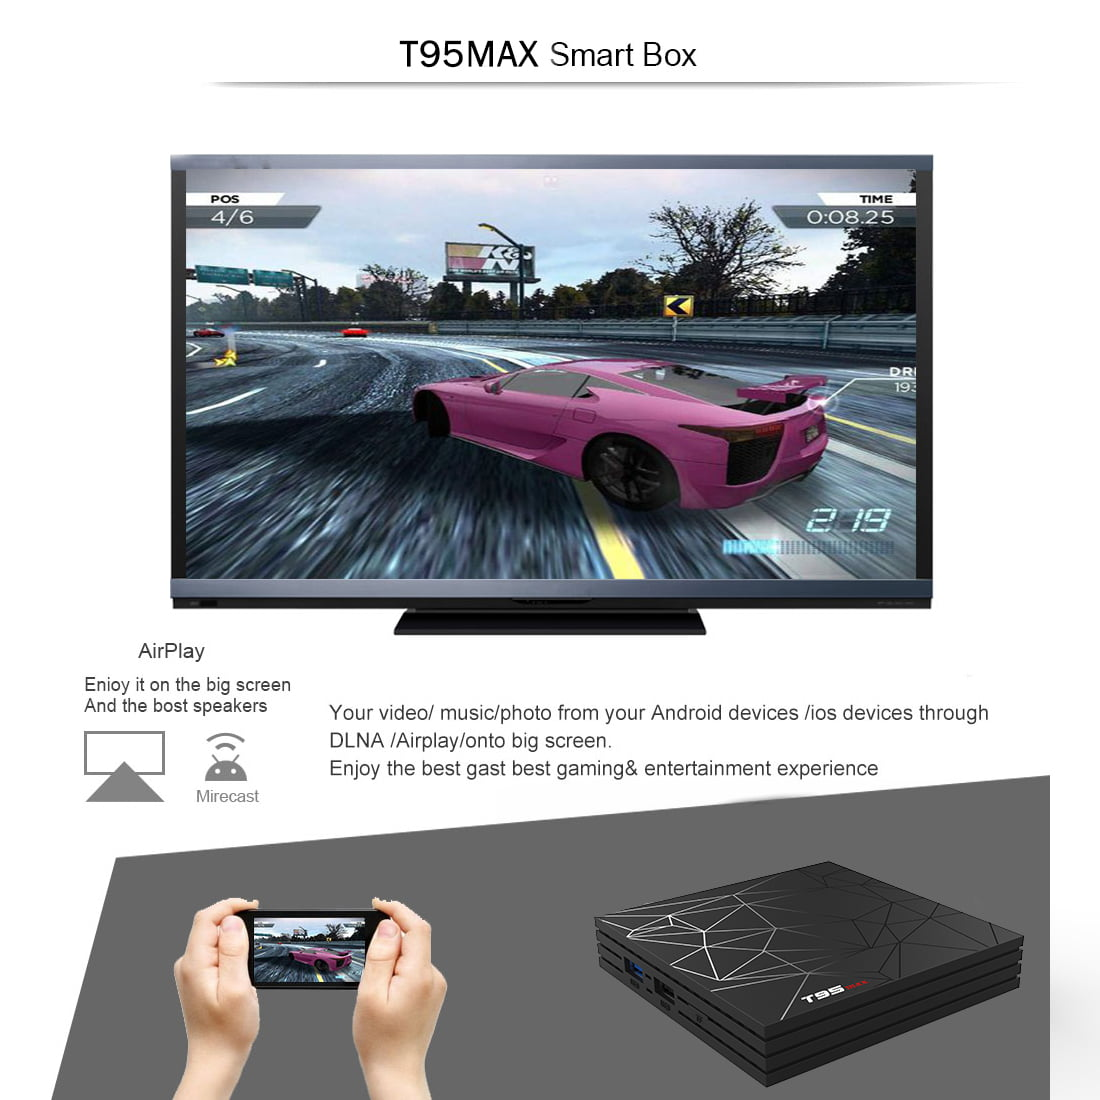 Firefly IV522 MXQ 4K android tv box quad core cortex a53 2 0ghz 1gb 8gb wifi hd 4k player 10